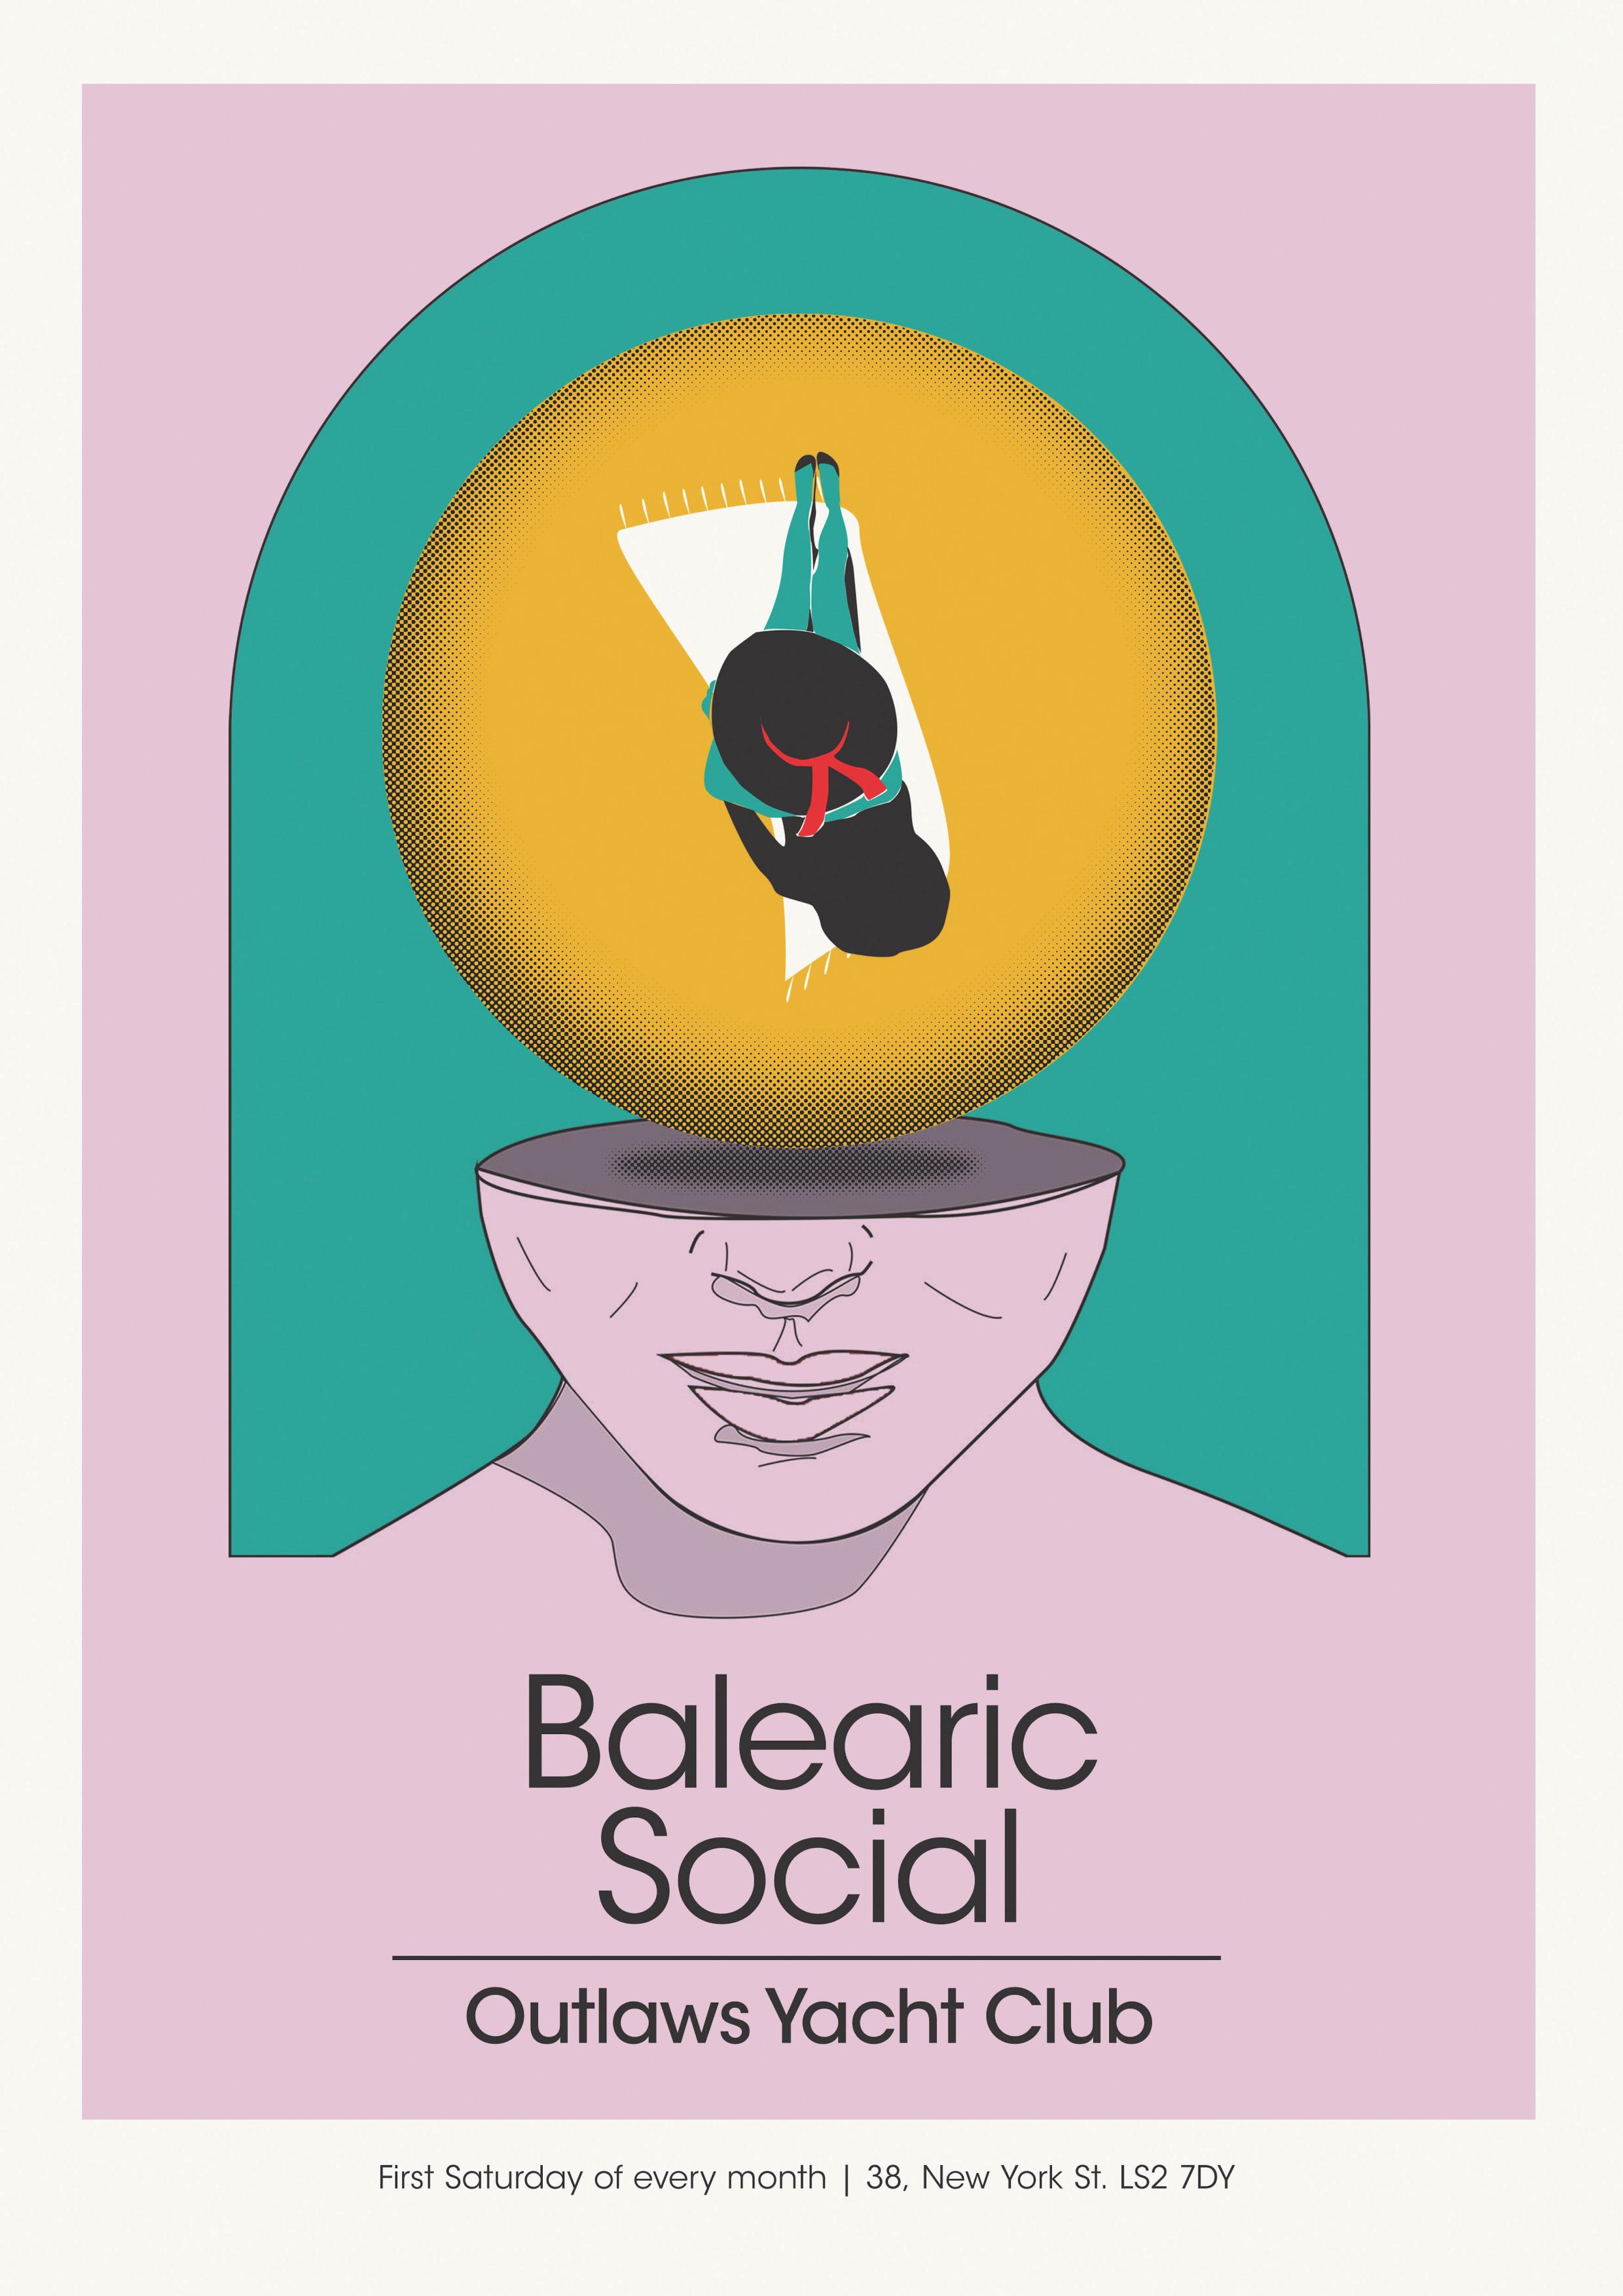 balearic social oyc print.jpg